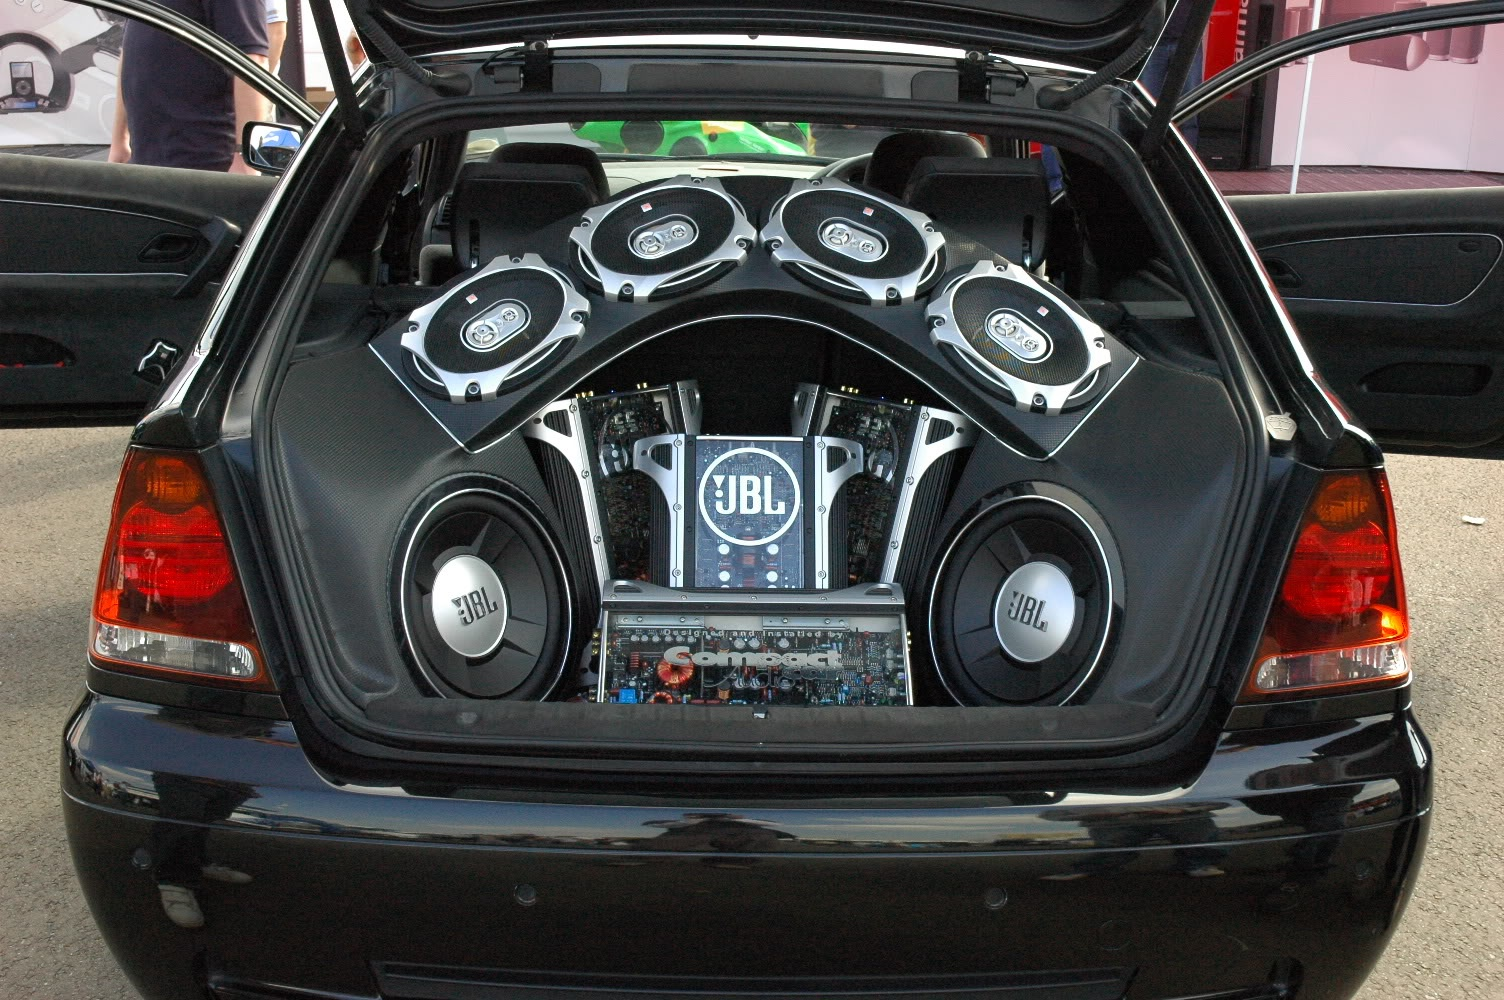 car audio system overview for your understanding. Black Bedroom Furniture Sets. Home Design Ideas